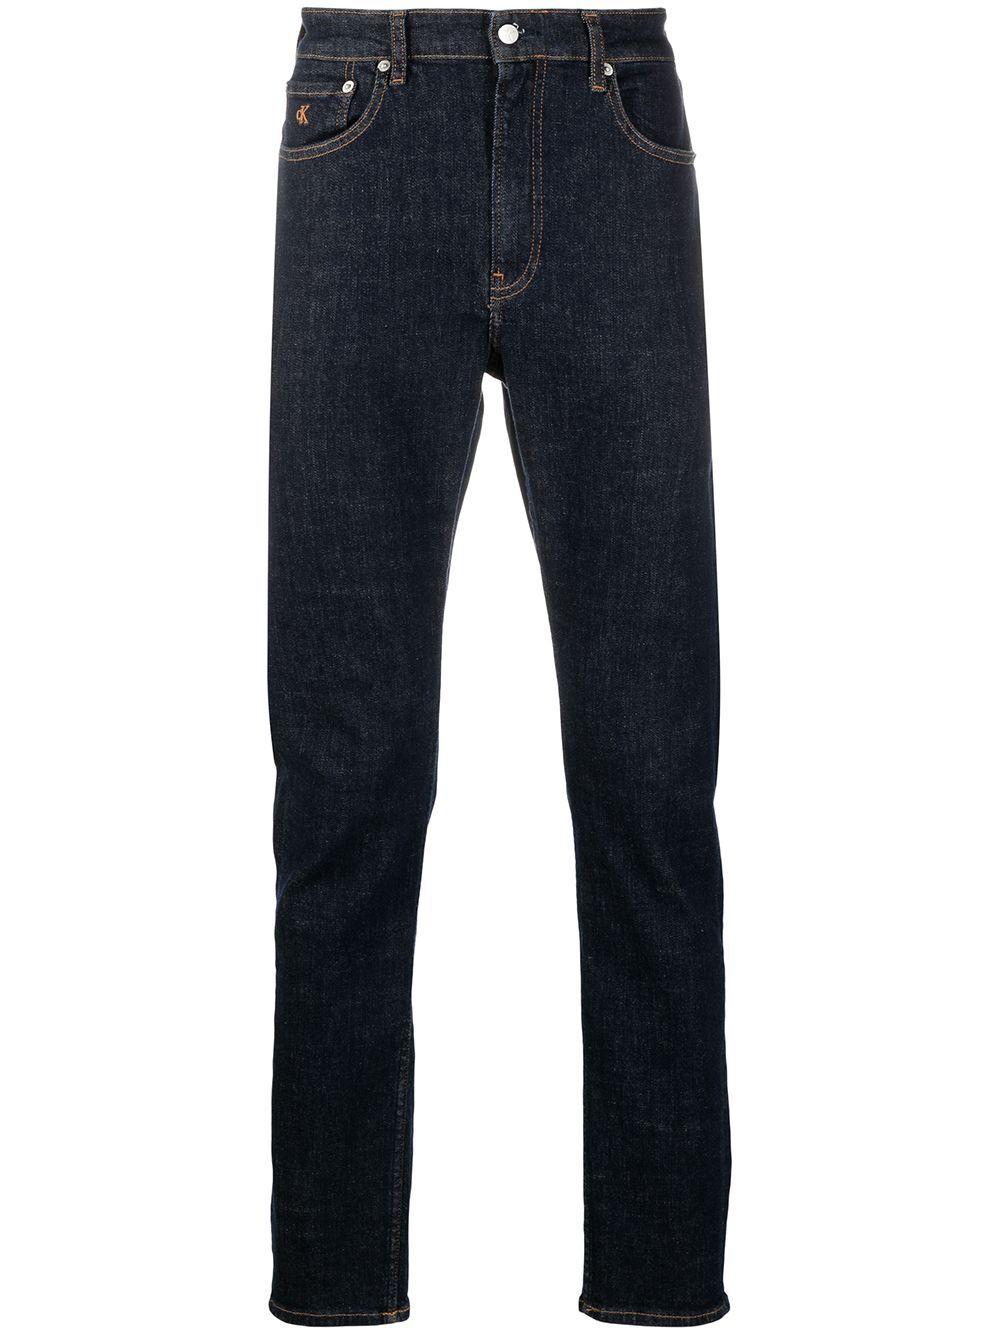 Calvin Klein Jeans slim fit jeans - Blue -Male